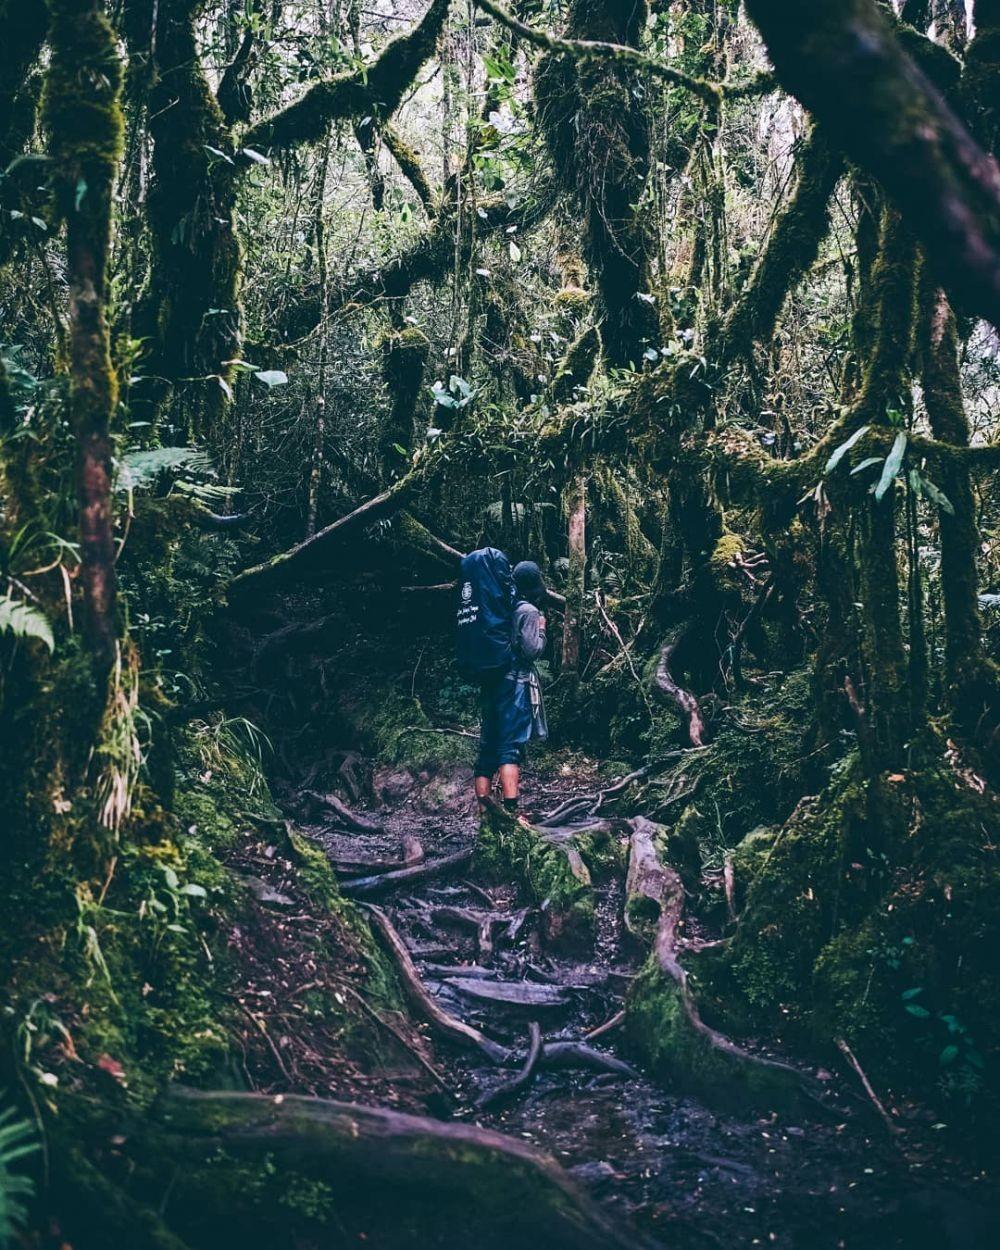 120605825 126546728902724 3828501209168521551 n b6156bf5081b880059ef3b712ca8c64e - Tempat Wisata Paling Angker di Sumatra Barat